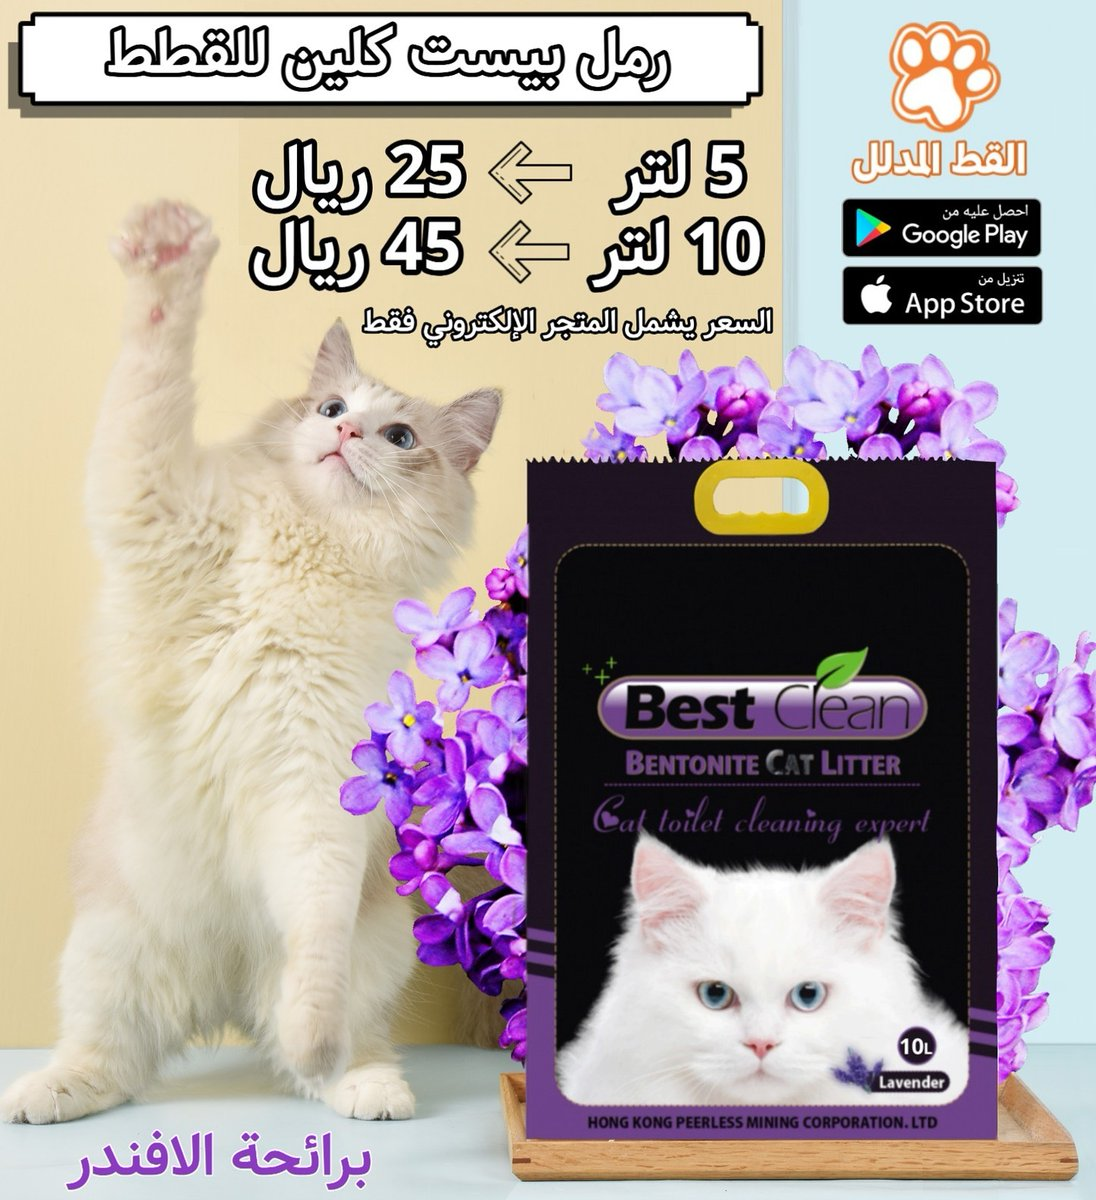 Cute Cat On Twitter رمل بيست كلين للقطط الان متوفر على المتجر الإلكتروني متوفر ب 3 روائح لافندر وتفاح وليمون وزن 5 لتر 25 ريال وزن 10 لتر 45